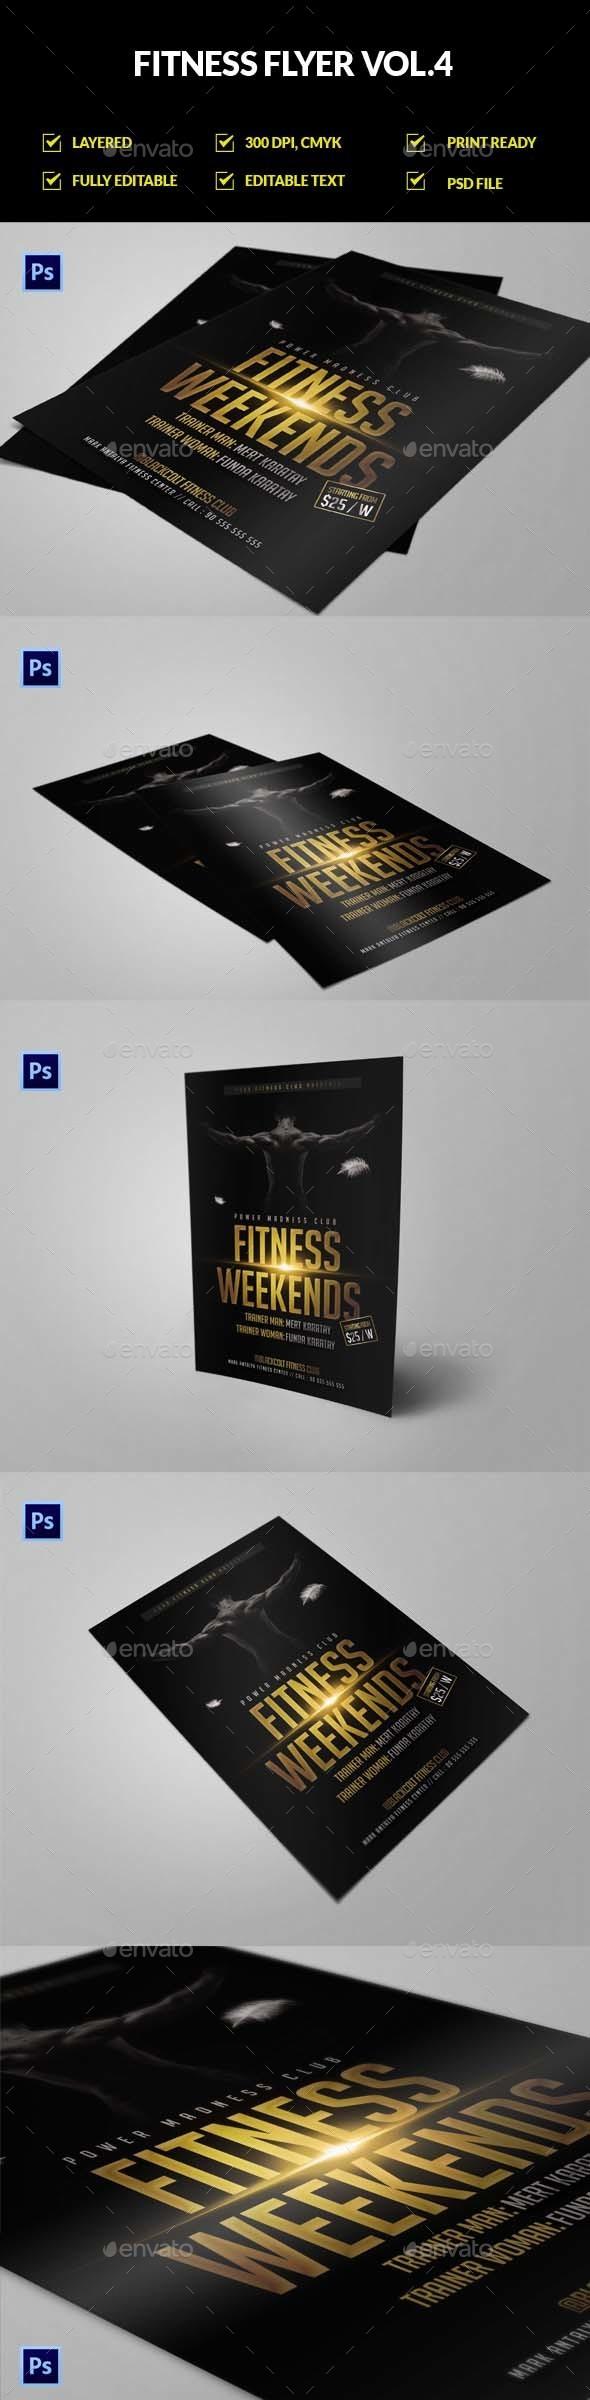 Fitness Flyer Vol.4